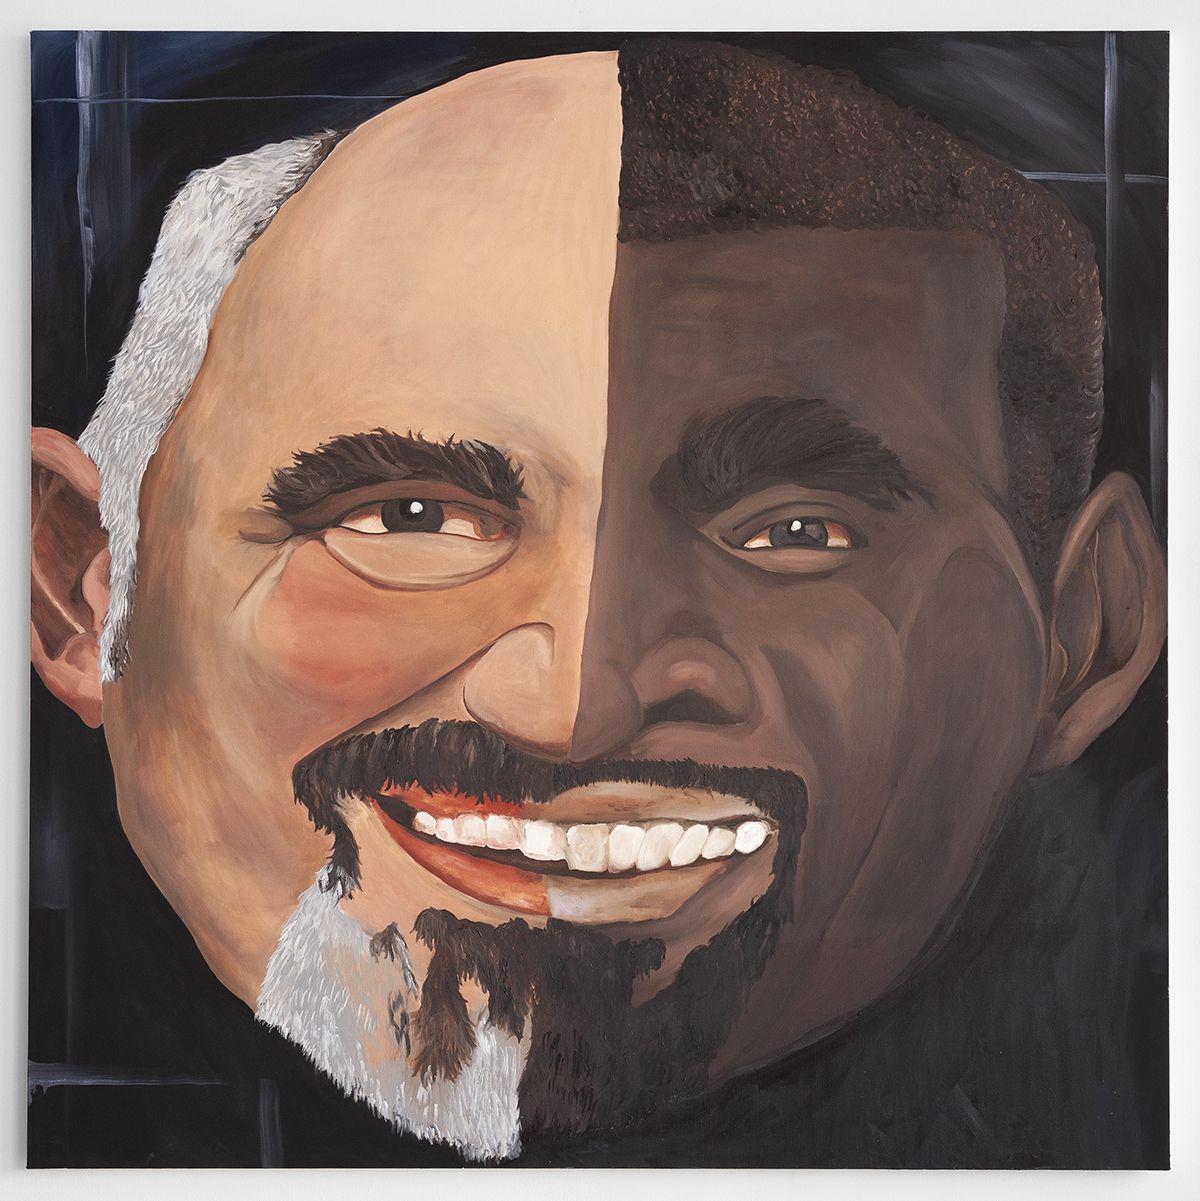 Mathieu Malouf Transitive high IQ painting 1 - davidjoseleywest, , 2018 Oil on canvas 72 x 72 inches (182.9 x 182.9 cm) (MAL.057)